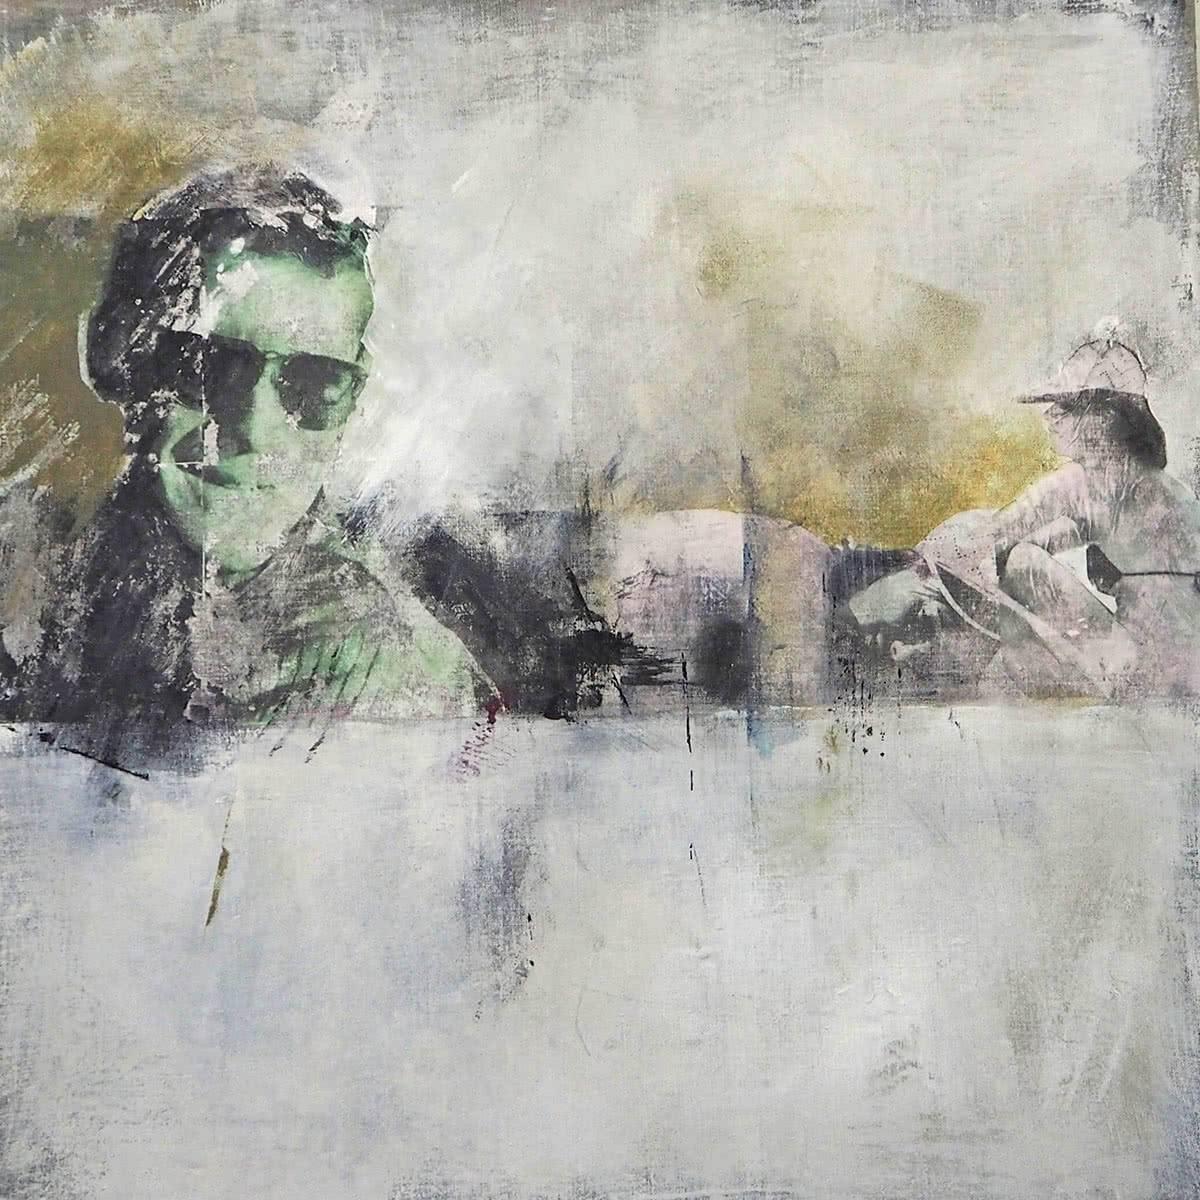 acryl auf leinwand 90 x 90 cm